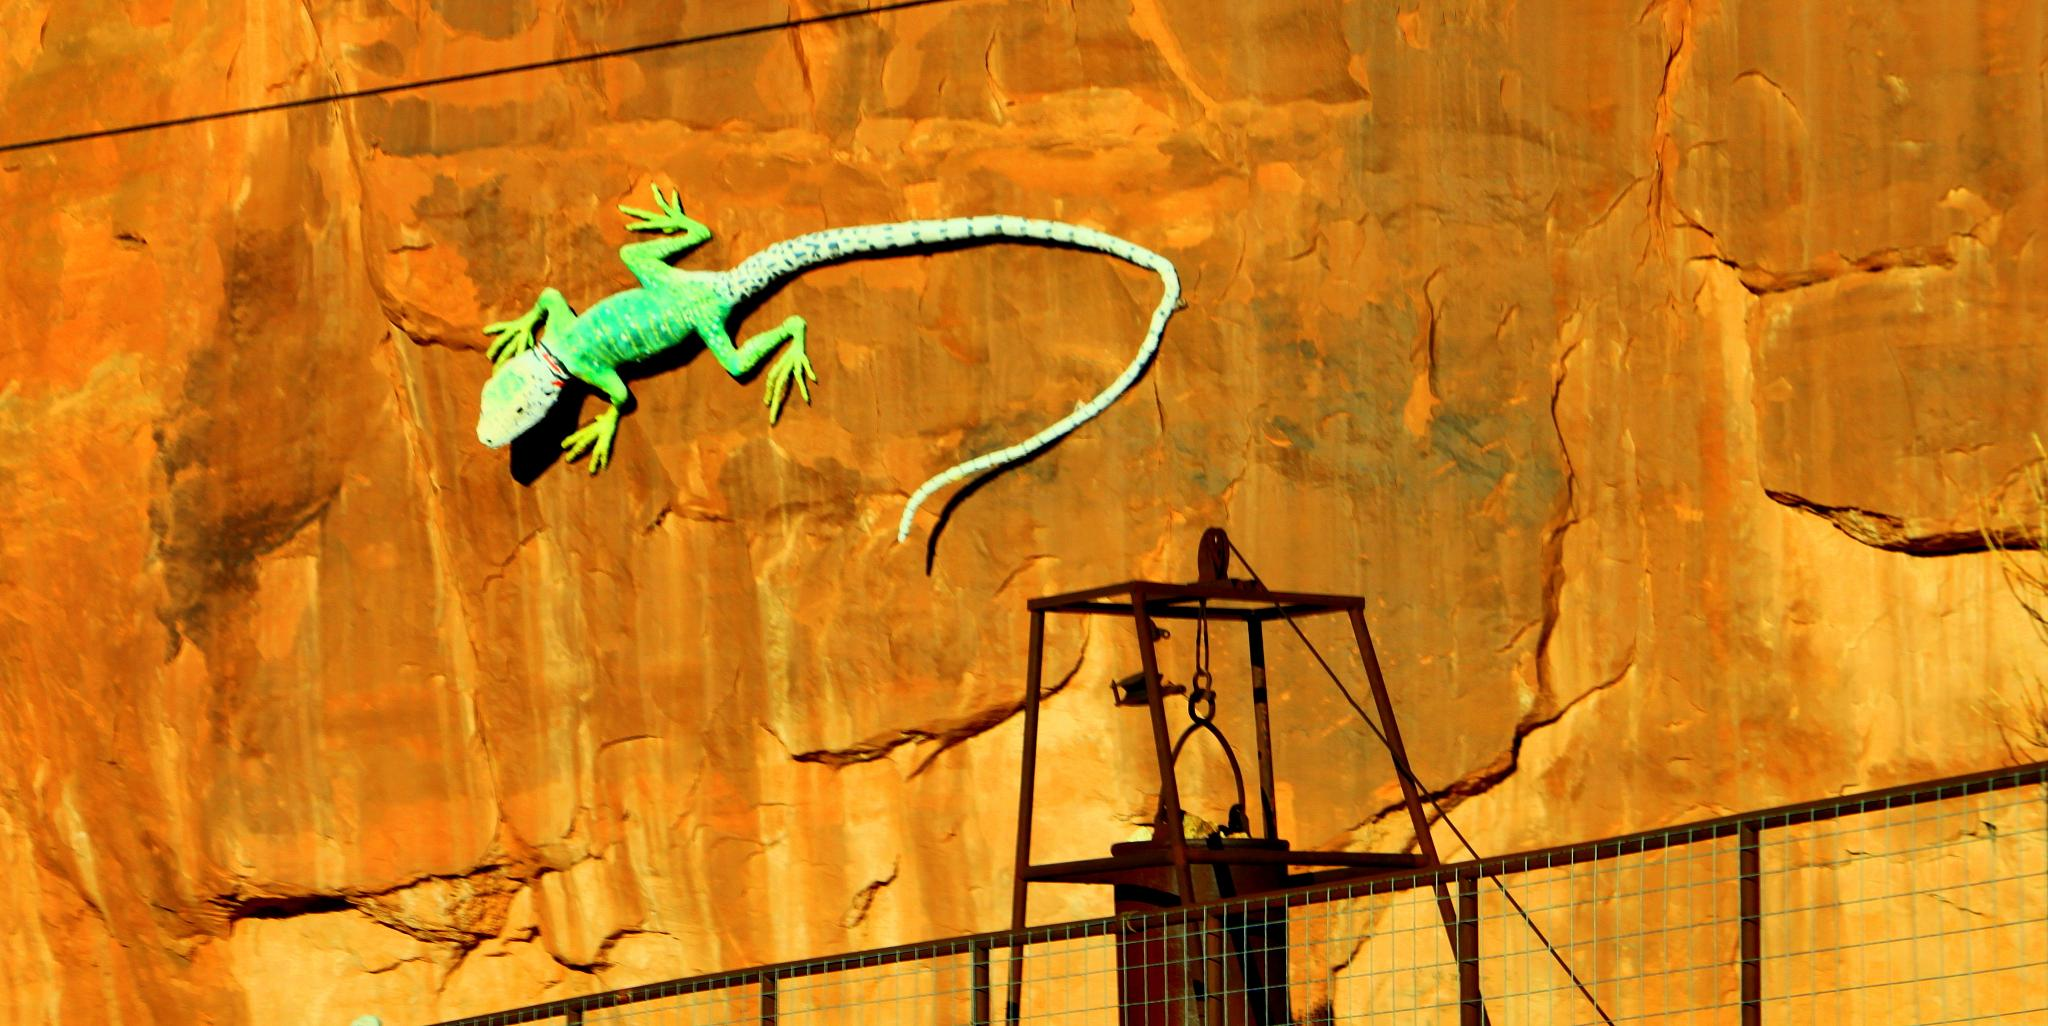 Lizard Art by JoHannah Boots Photography